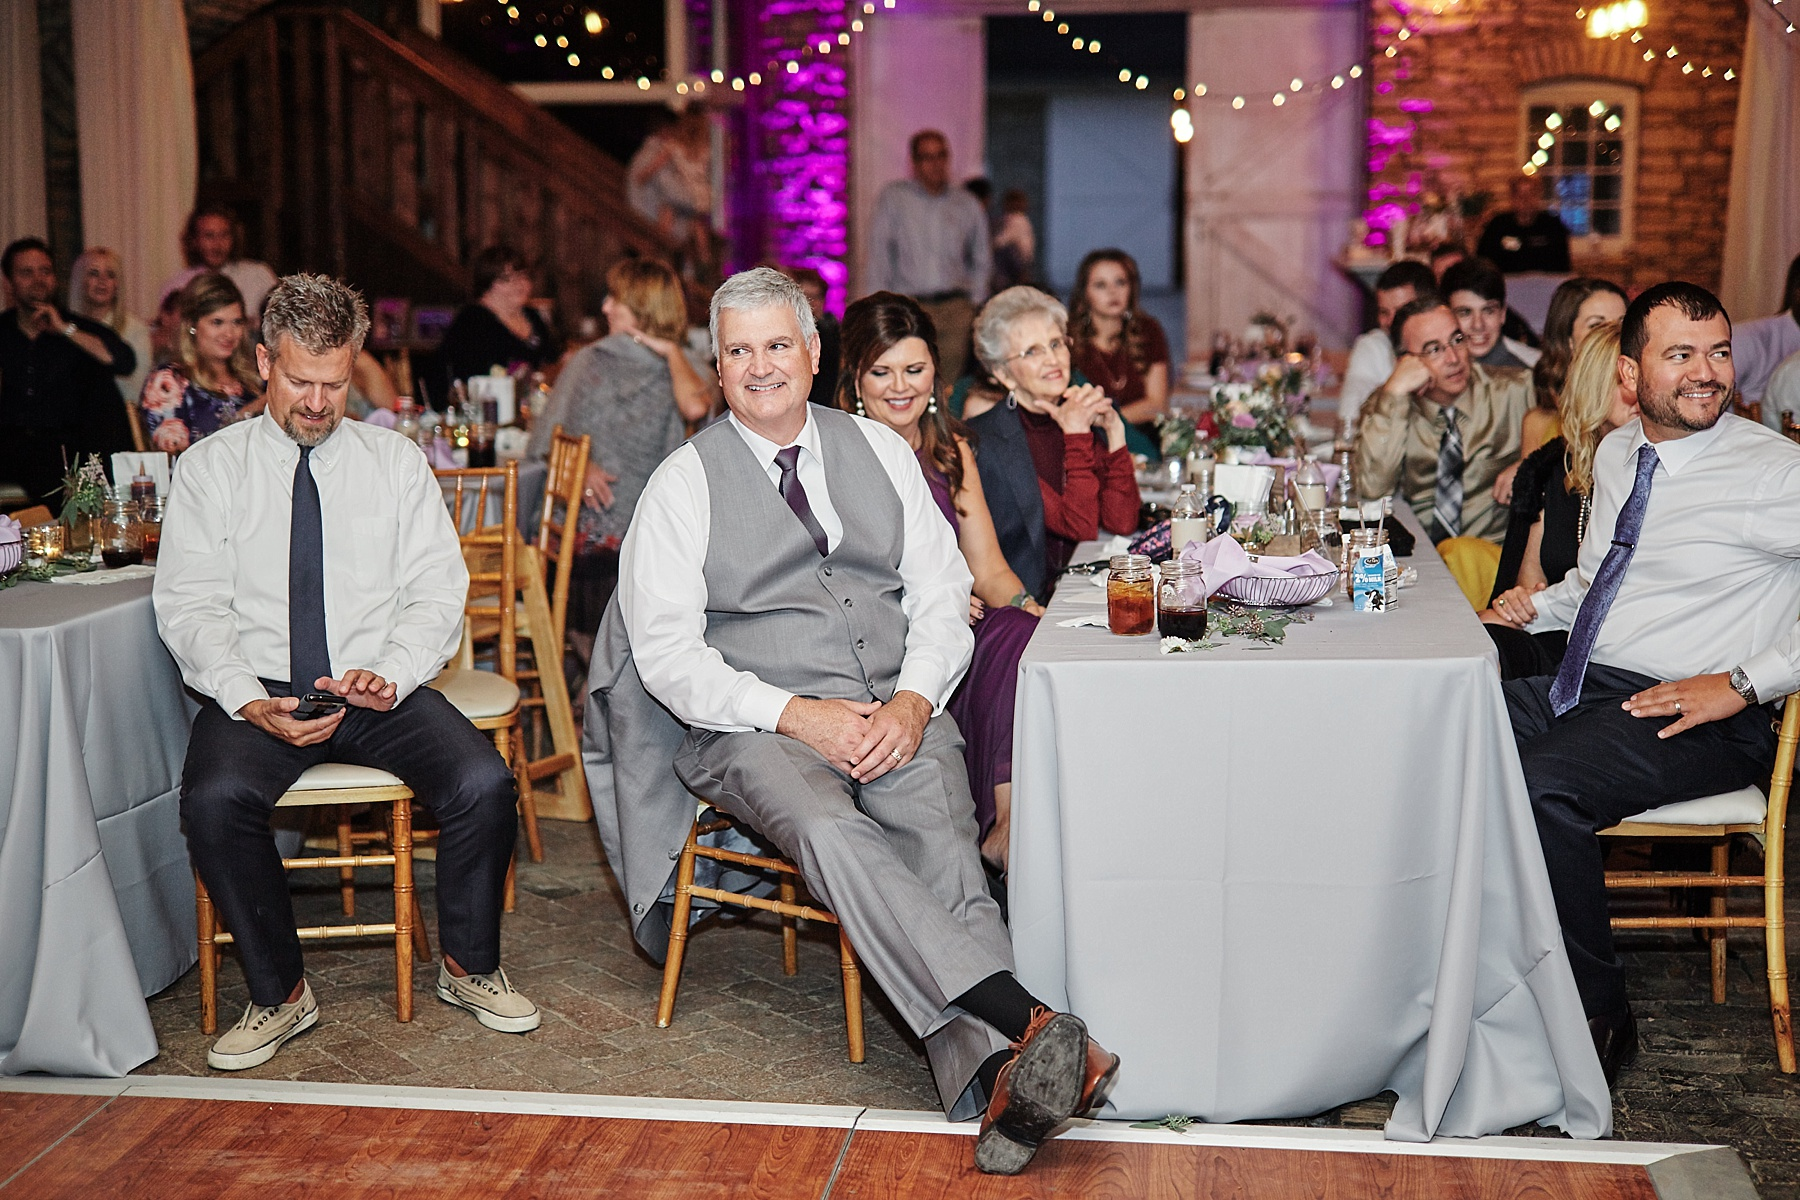 Maywood-Stone-Barn-Wedding-Rochester-Minnesota-Perry-James-Photo_0686.jpg